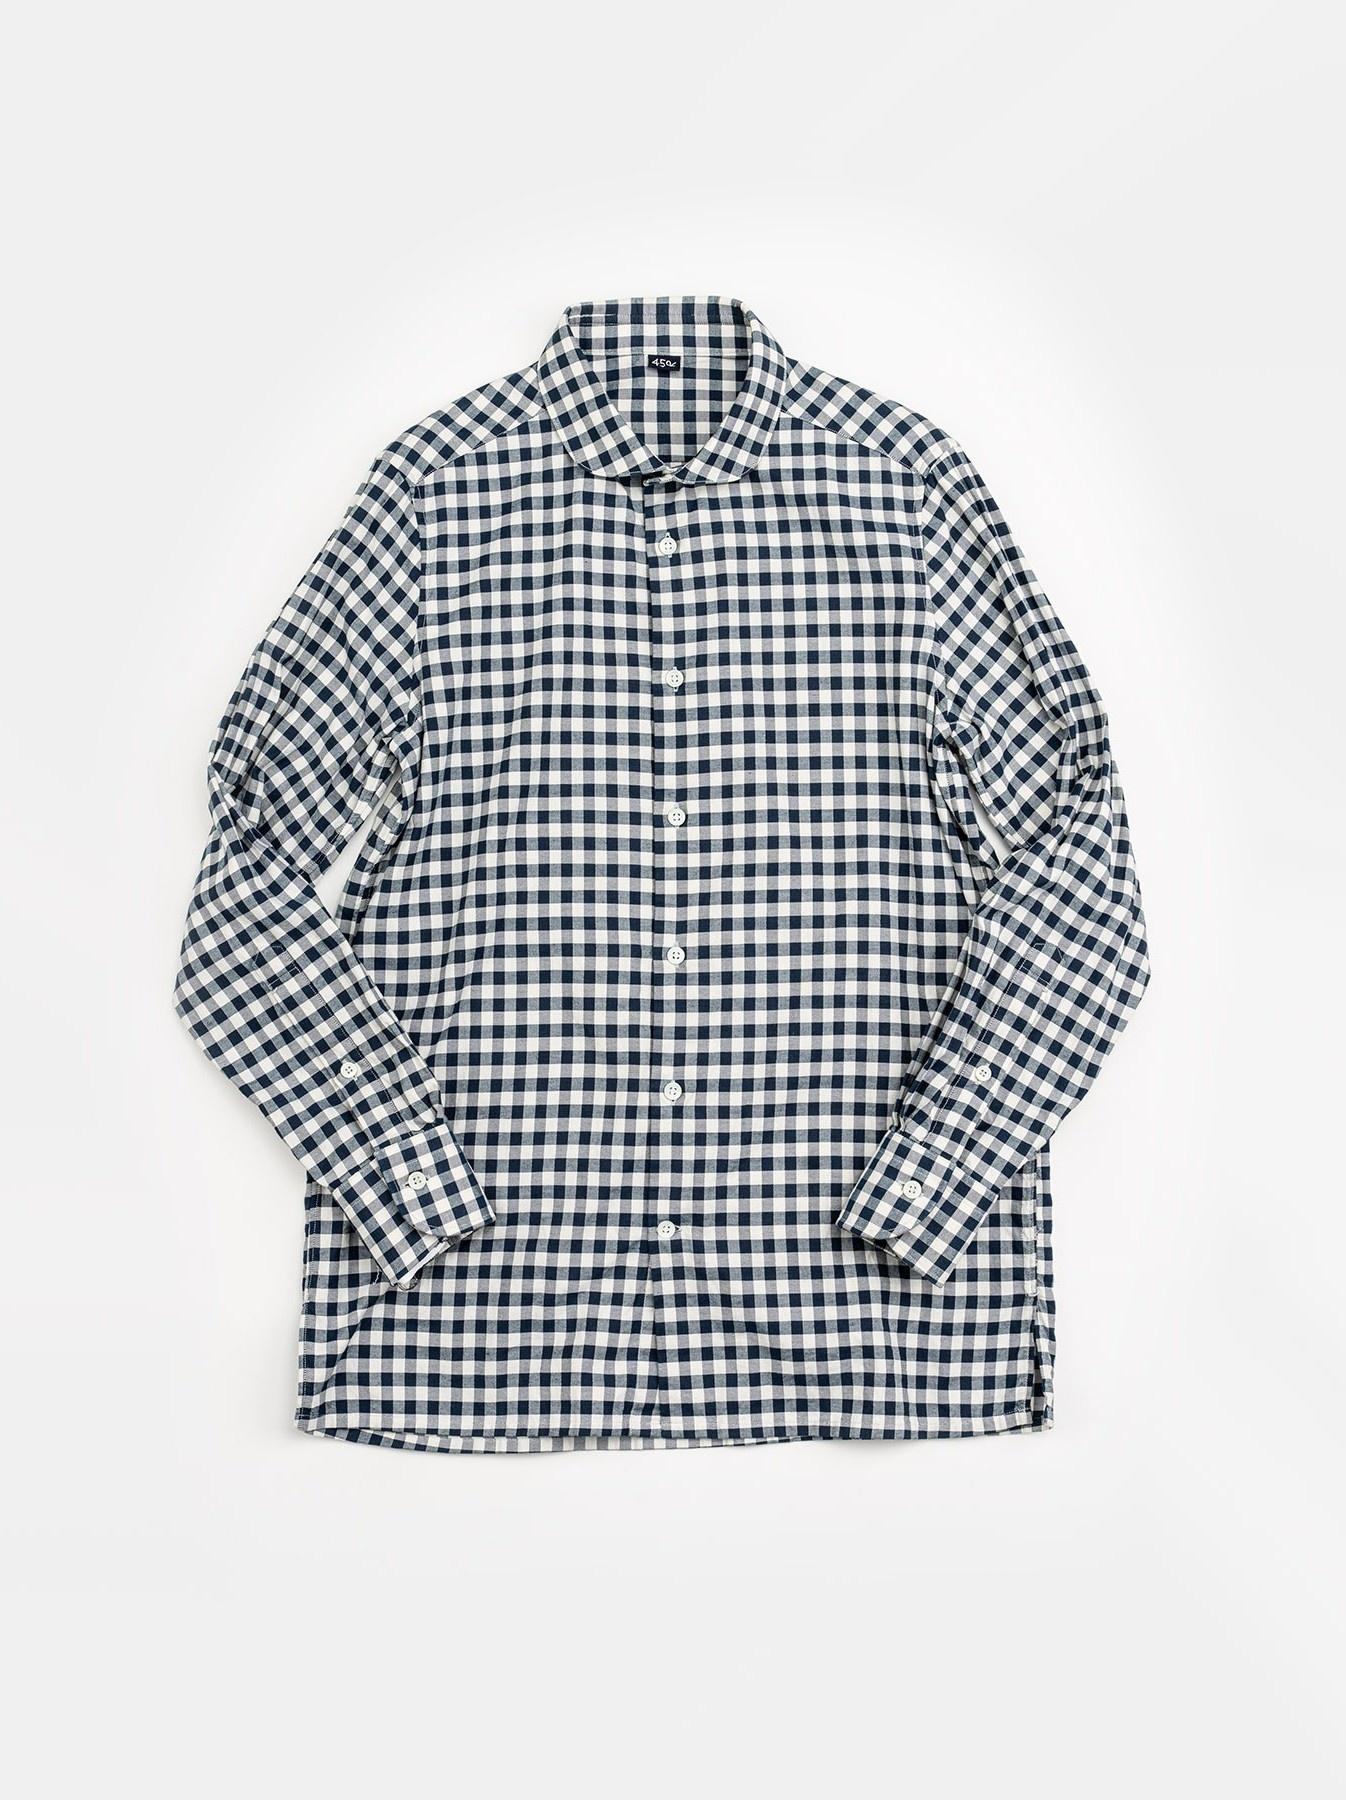 WH Indigo Oxford 908 Round Collar Shirt-4